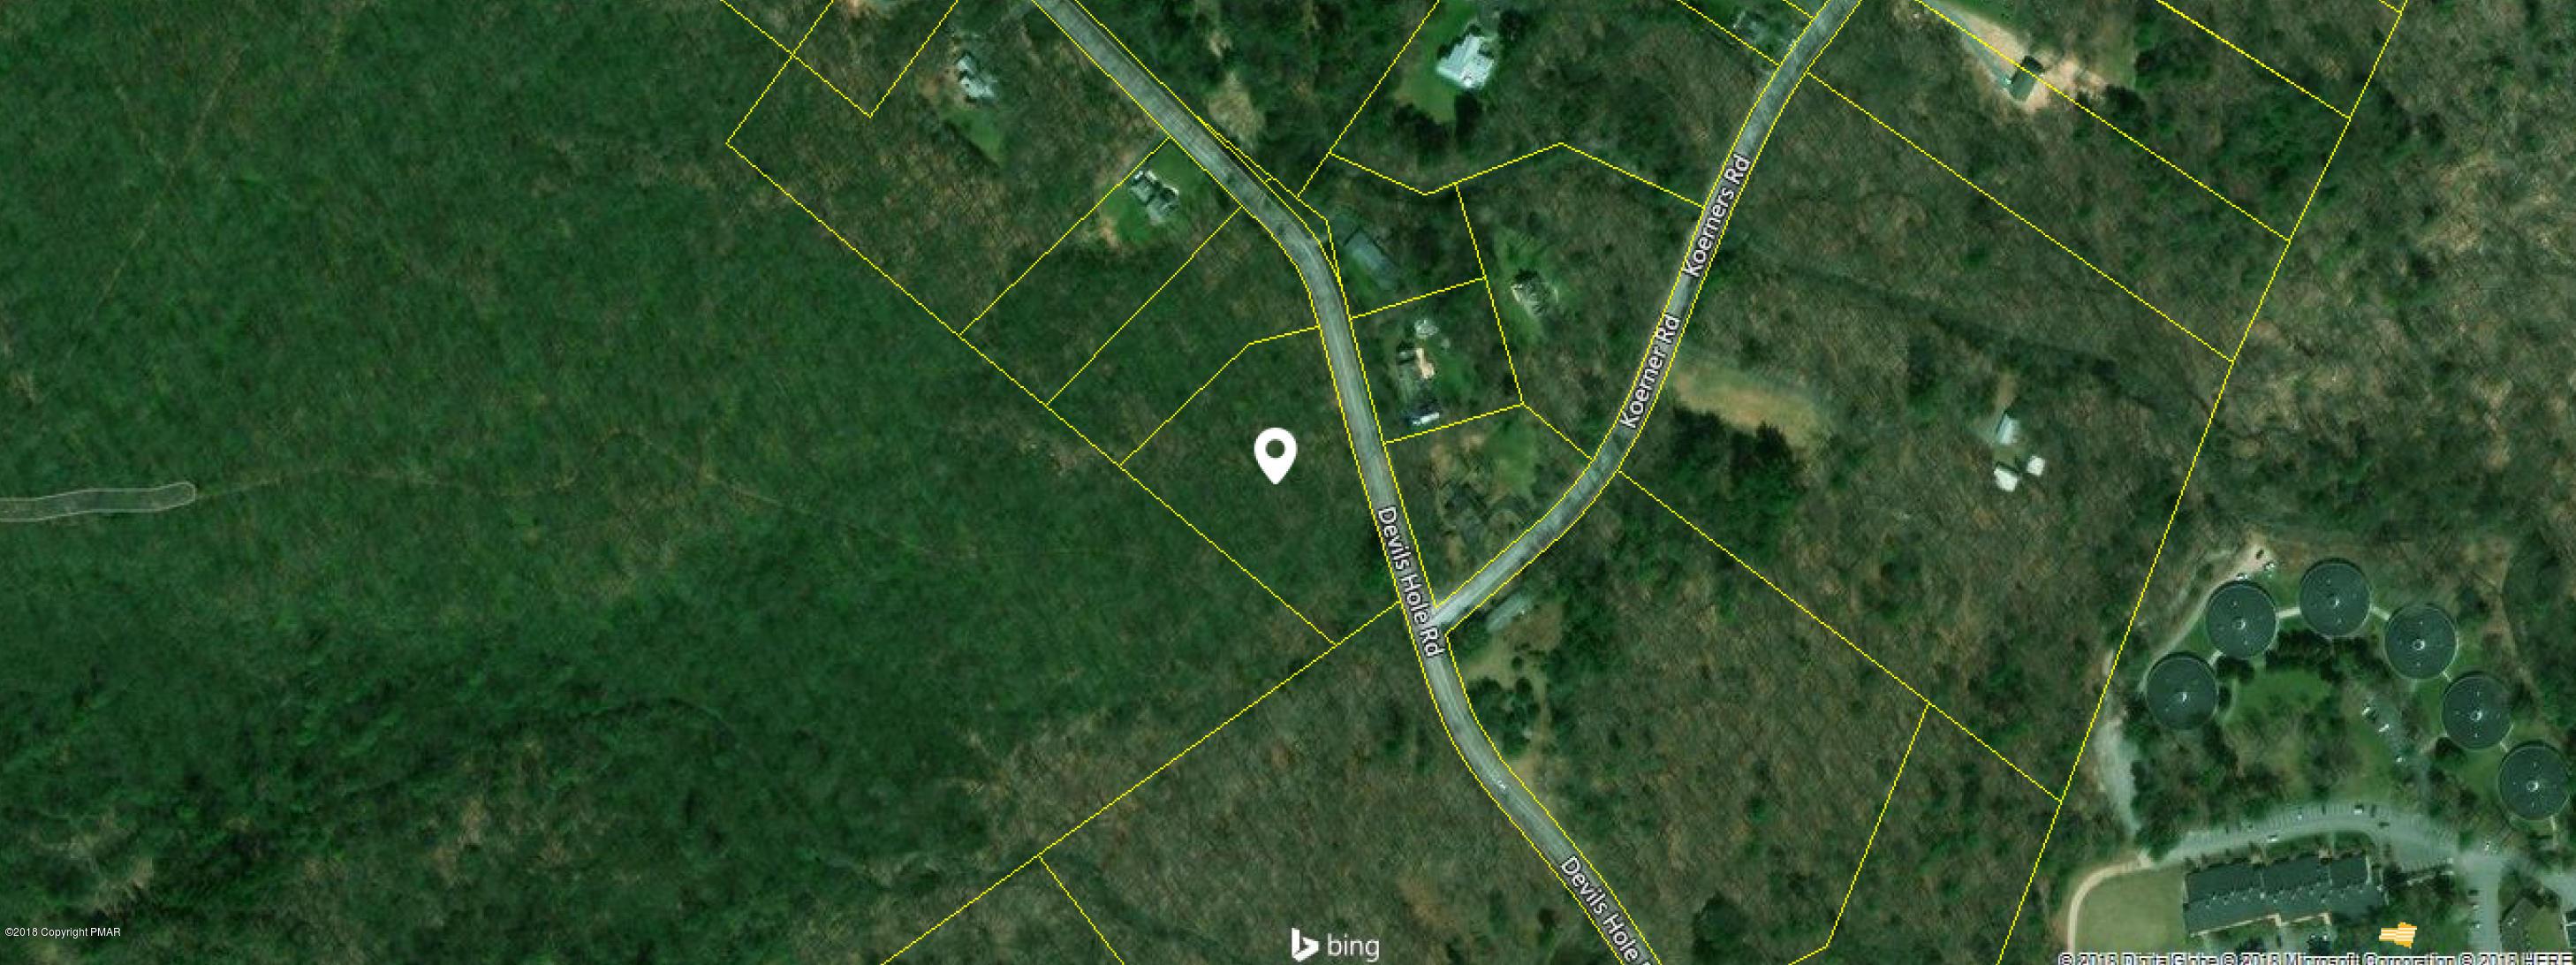 T 561 1 Devils Hole Road, Cresco, PA 18326